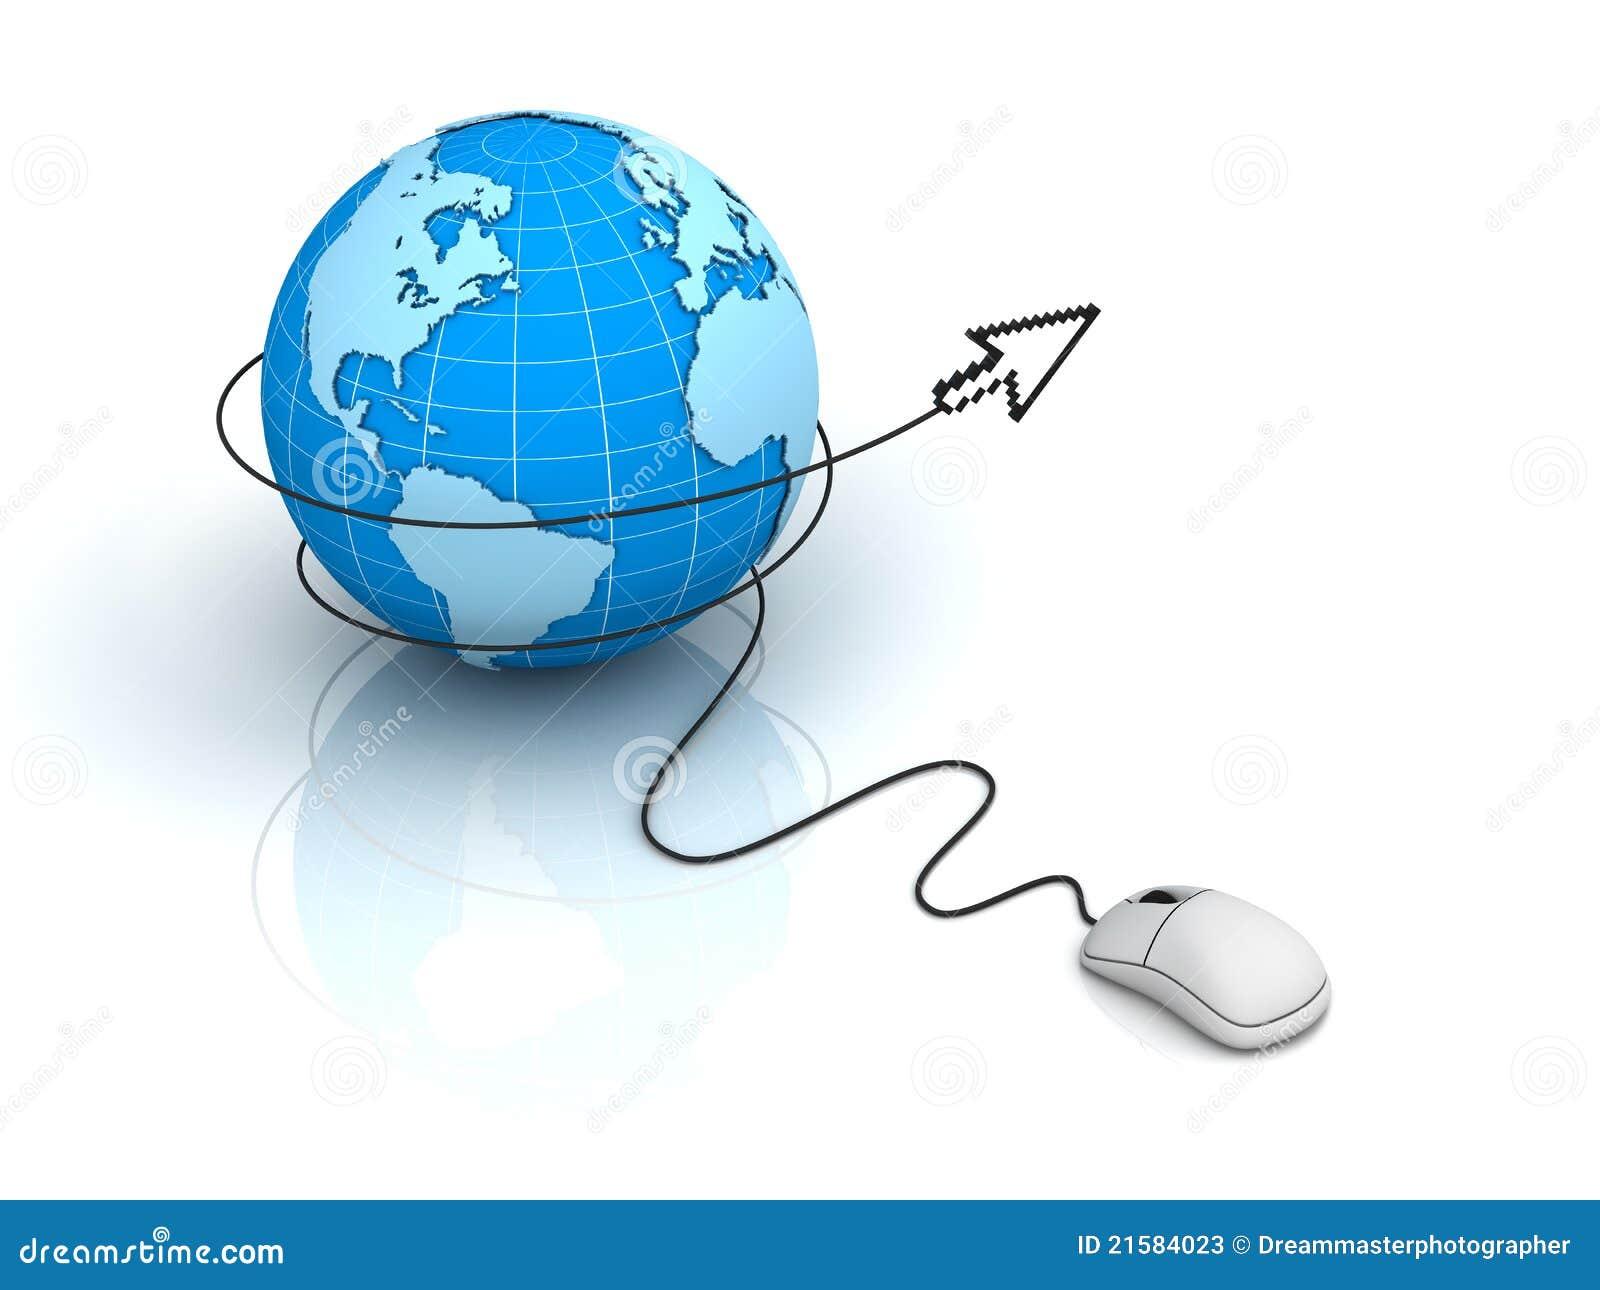 globe business plan 5 mbps internet